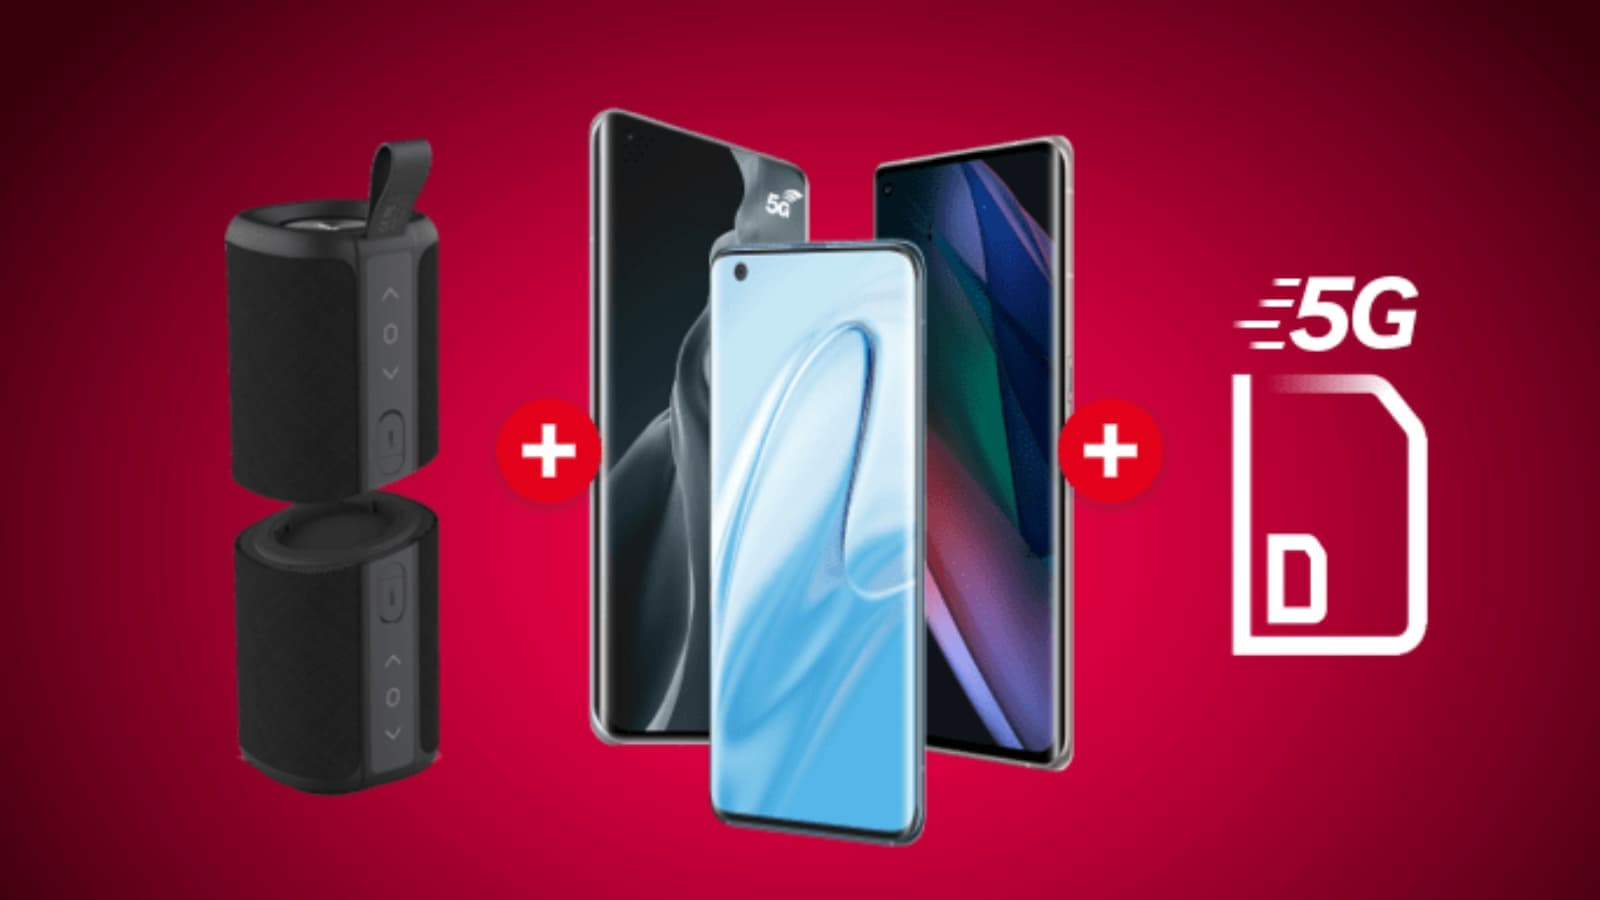 Trio gagnant : smartphone 5G + forfait 5G = enceinte gratuite